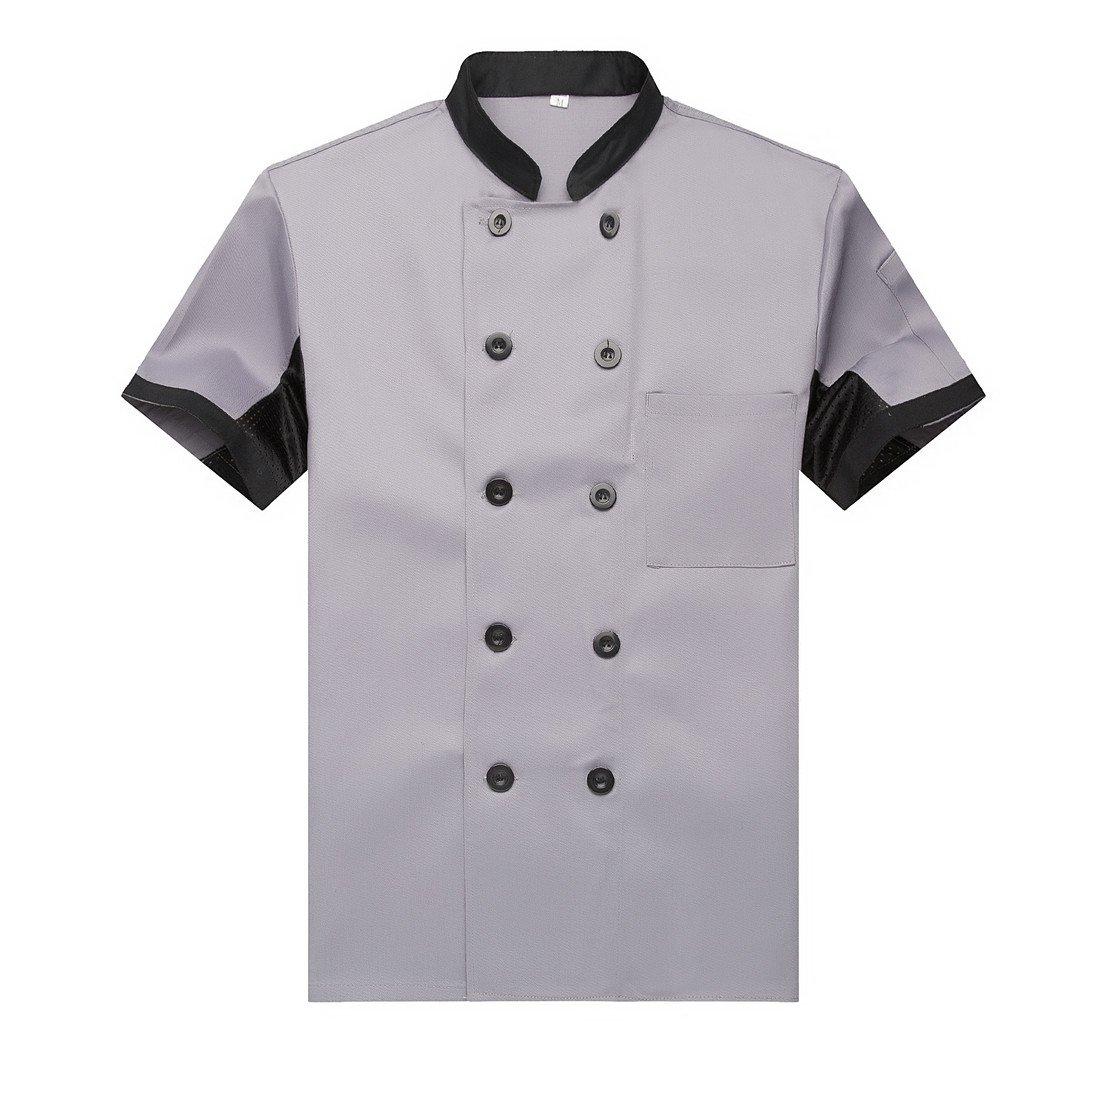 Chef Jackets Waiter Coat Short Sleeves Underarm Mesh Size S (Label:L) Grey